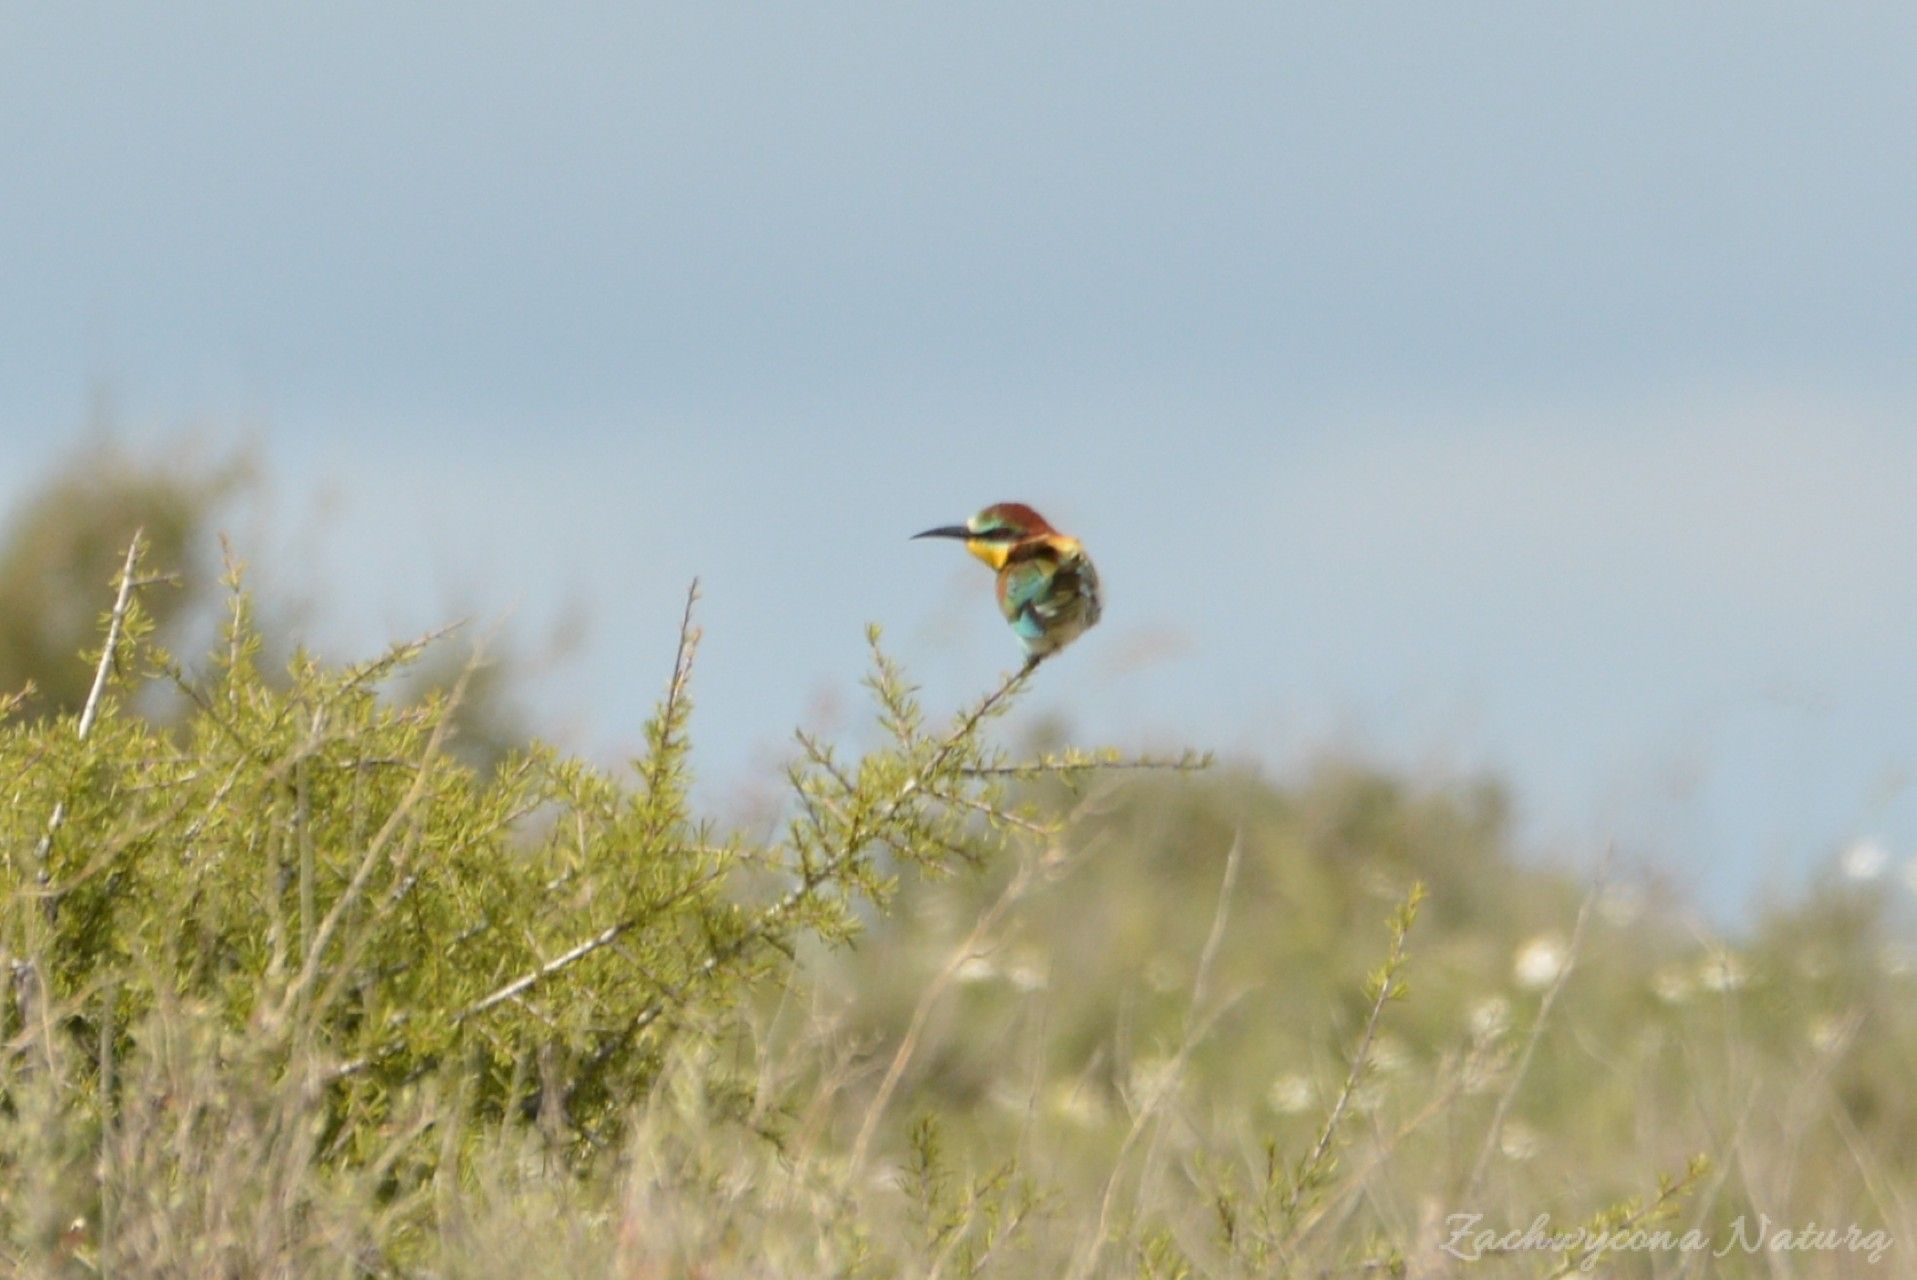 zolna-kolorowa-jak-papuga-merops-apiaster-bee-eater-11